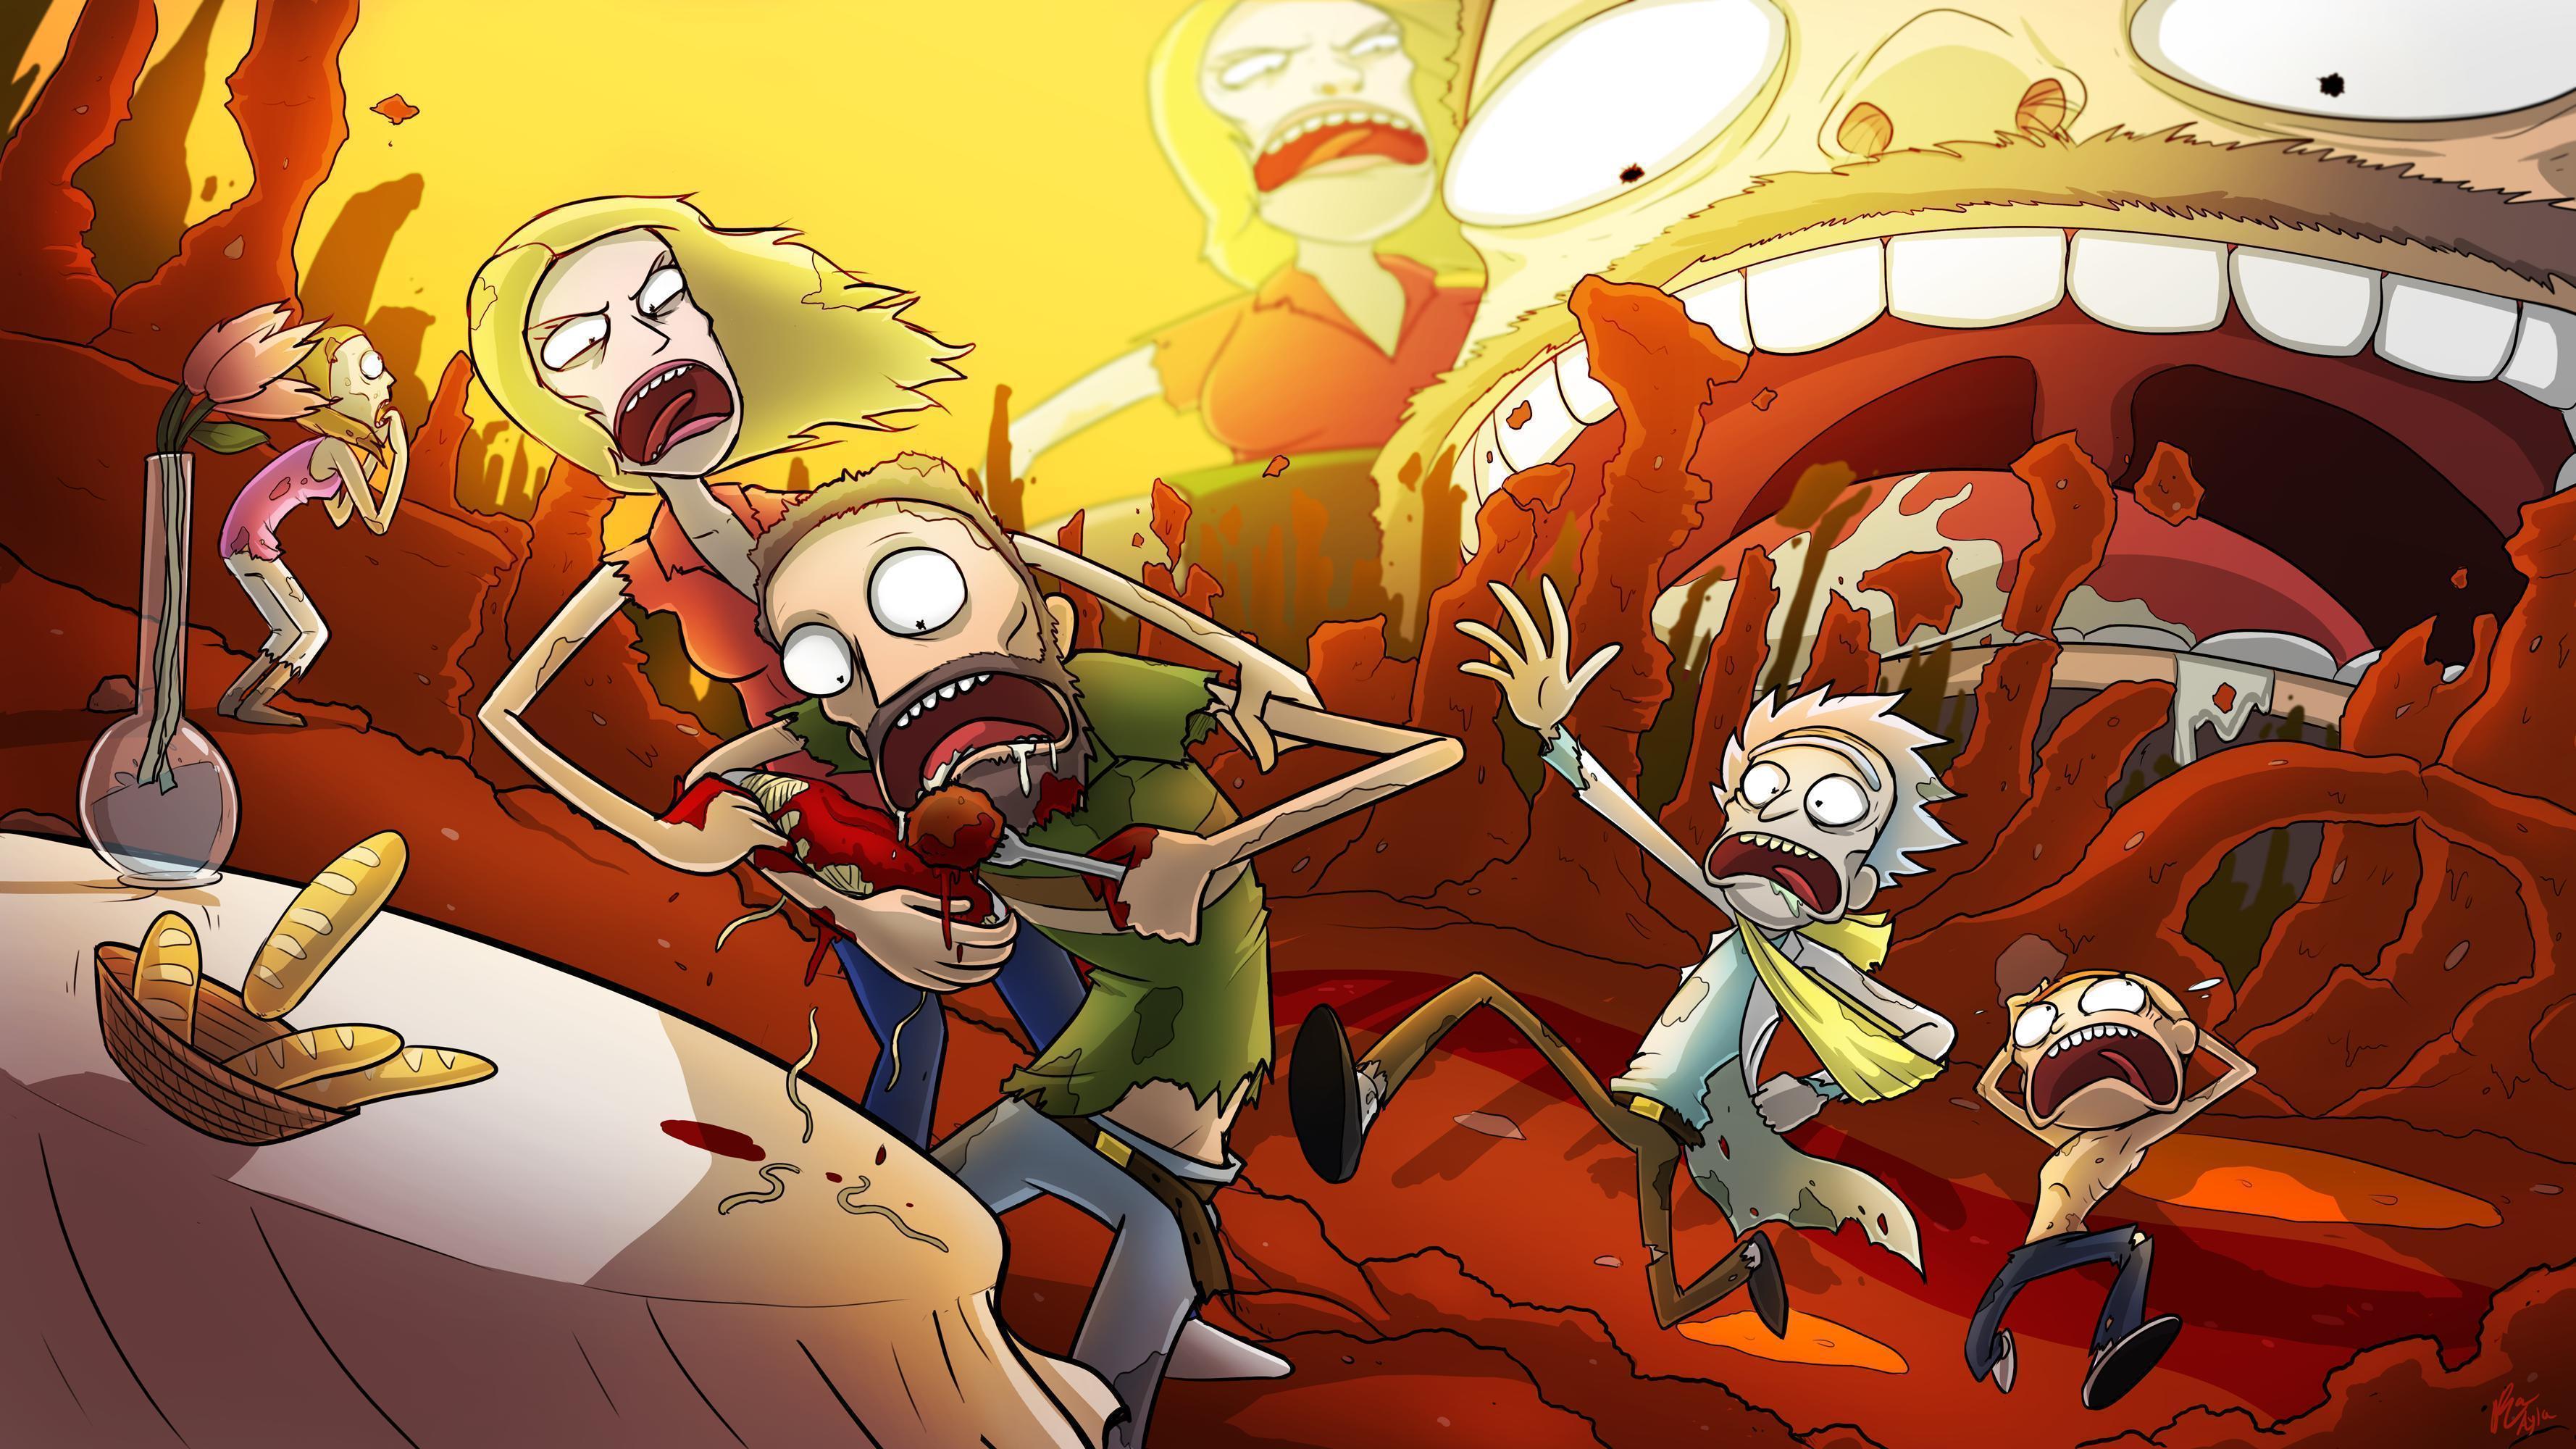 100+ Rick And Morty Wallpapers on WallpaperSafari